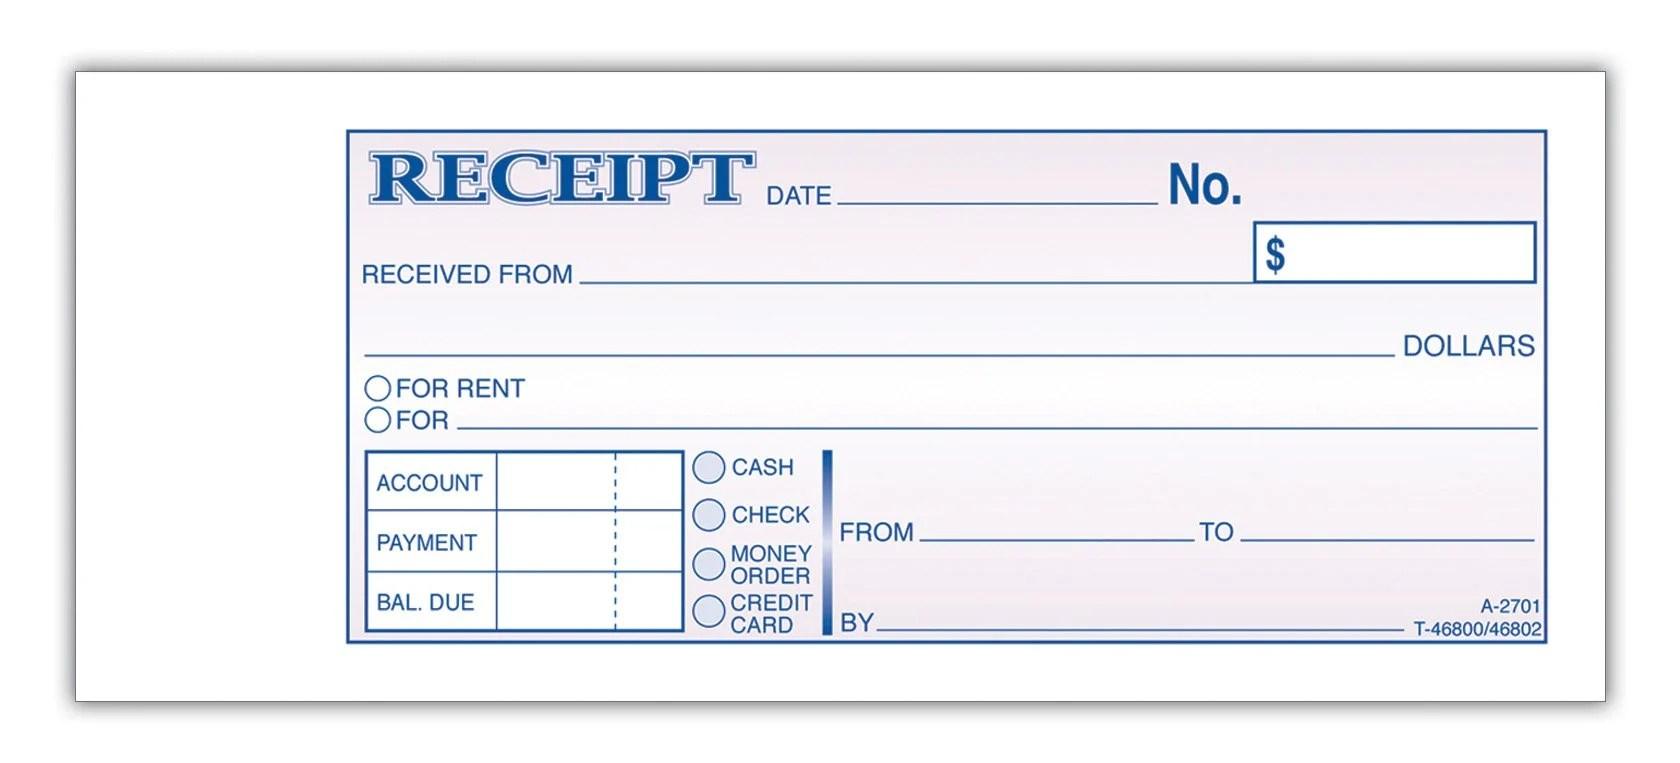 receipt for rent – Receipt for Rent